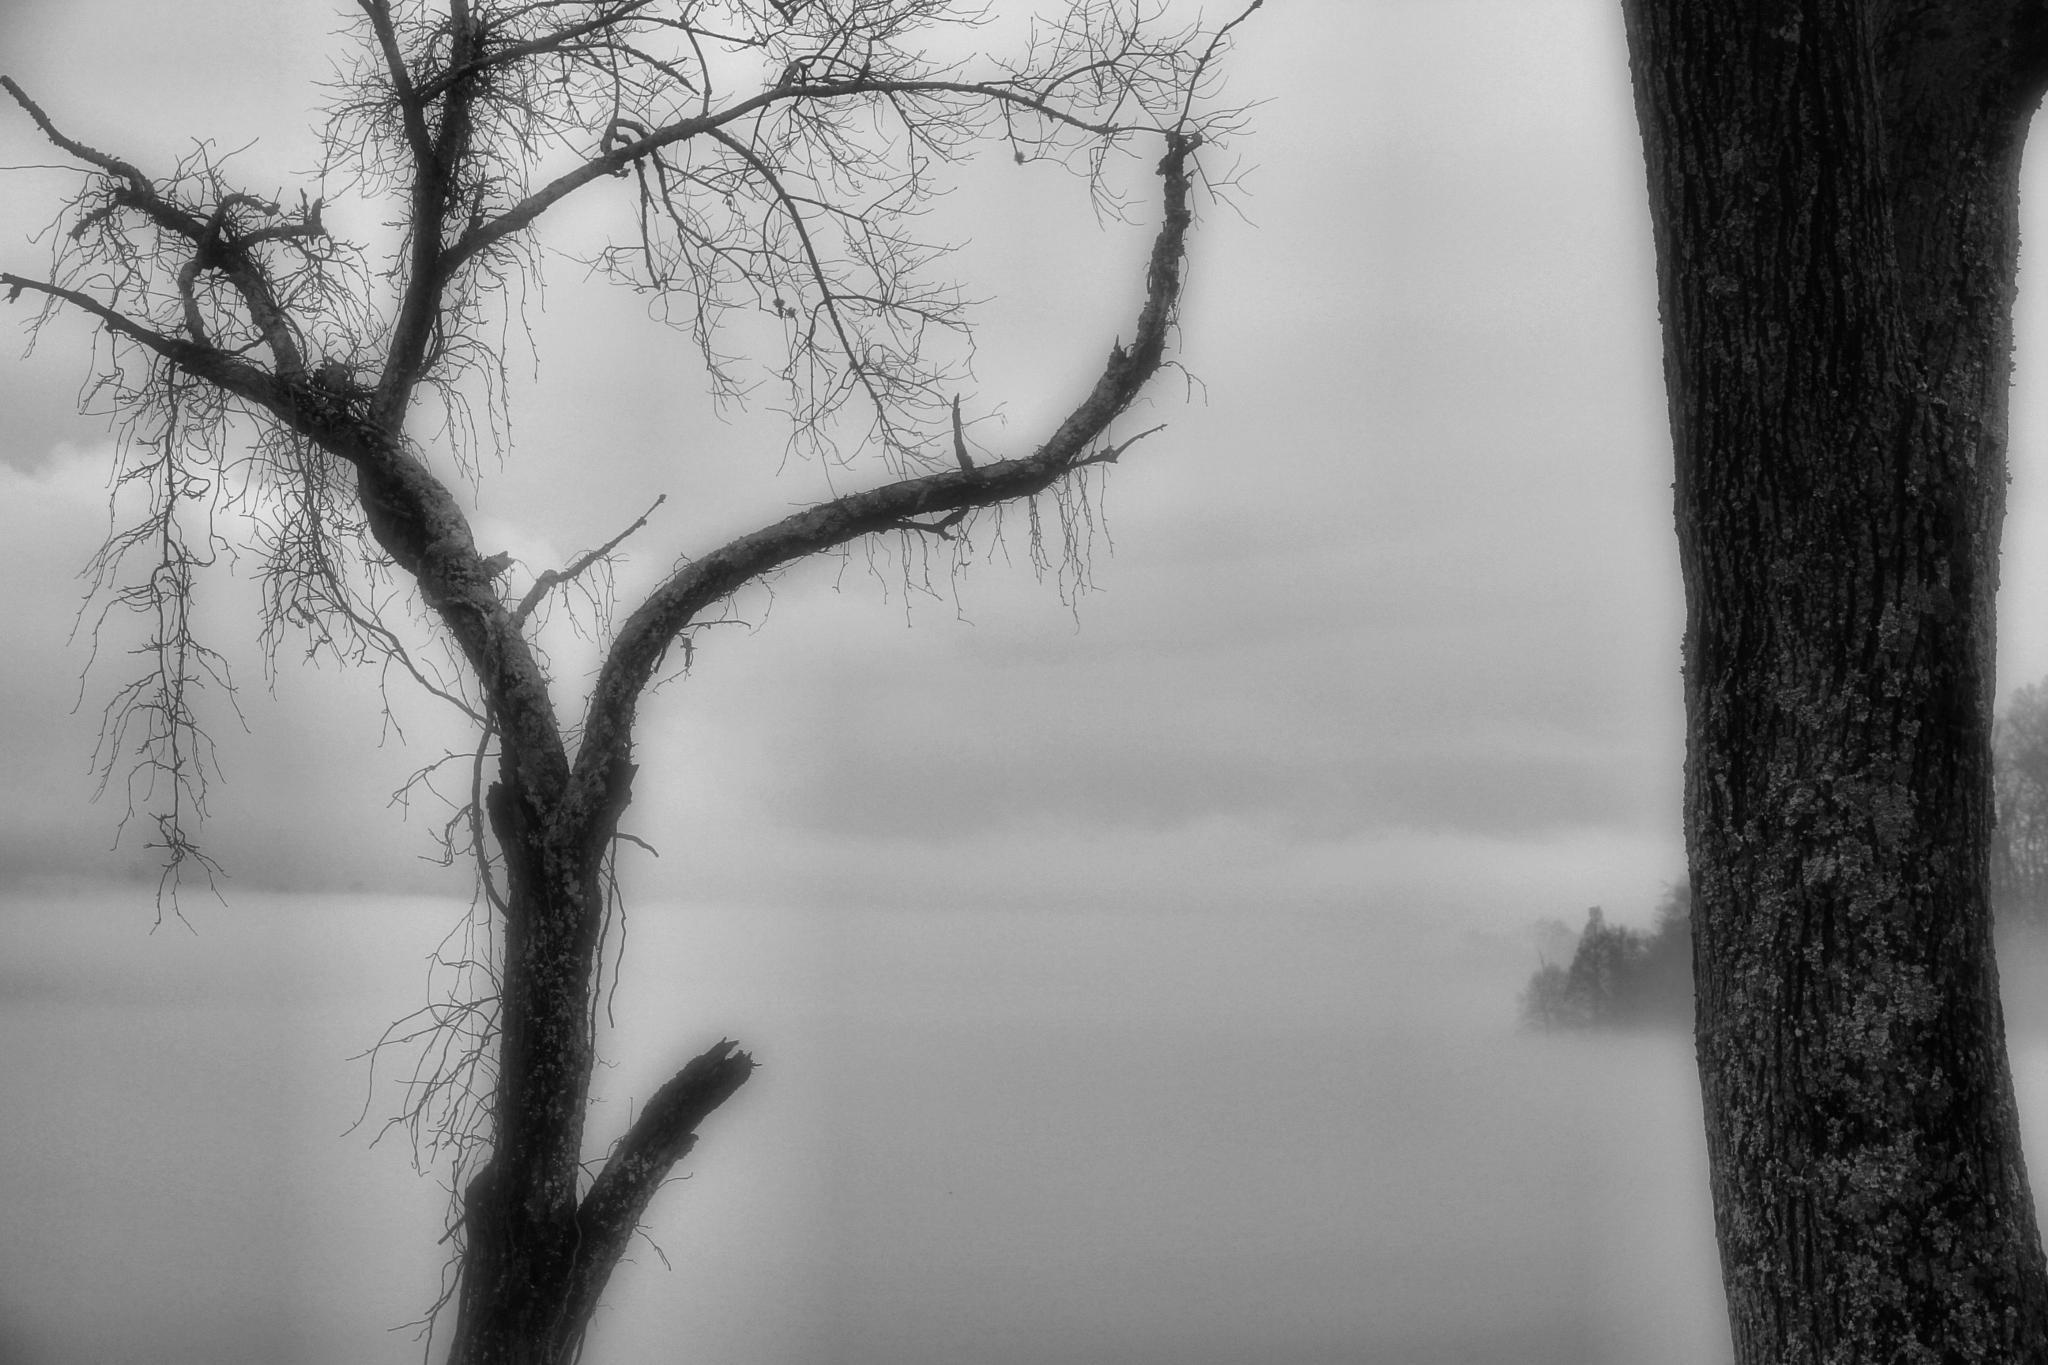 Rainy and Foggy Lake by daryl.chamlee.9